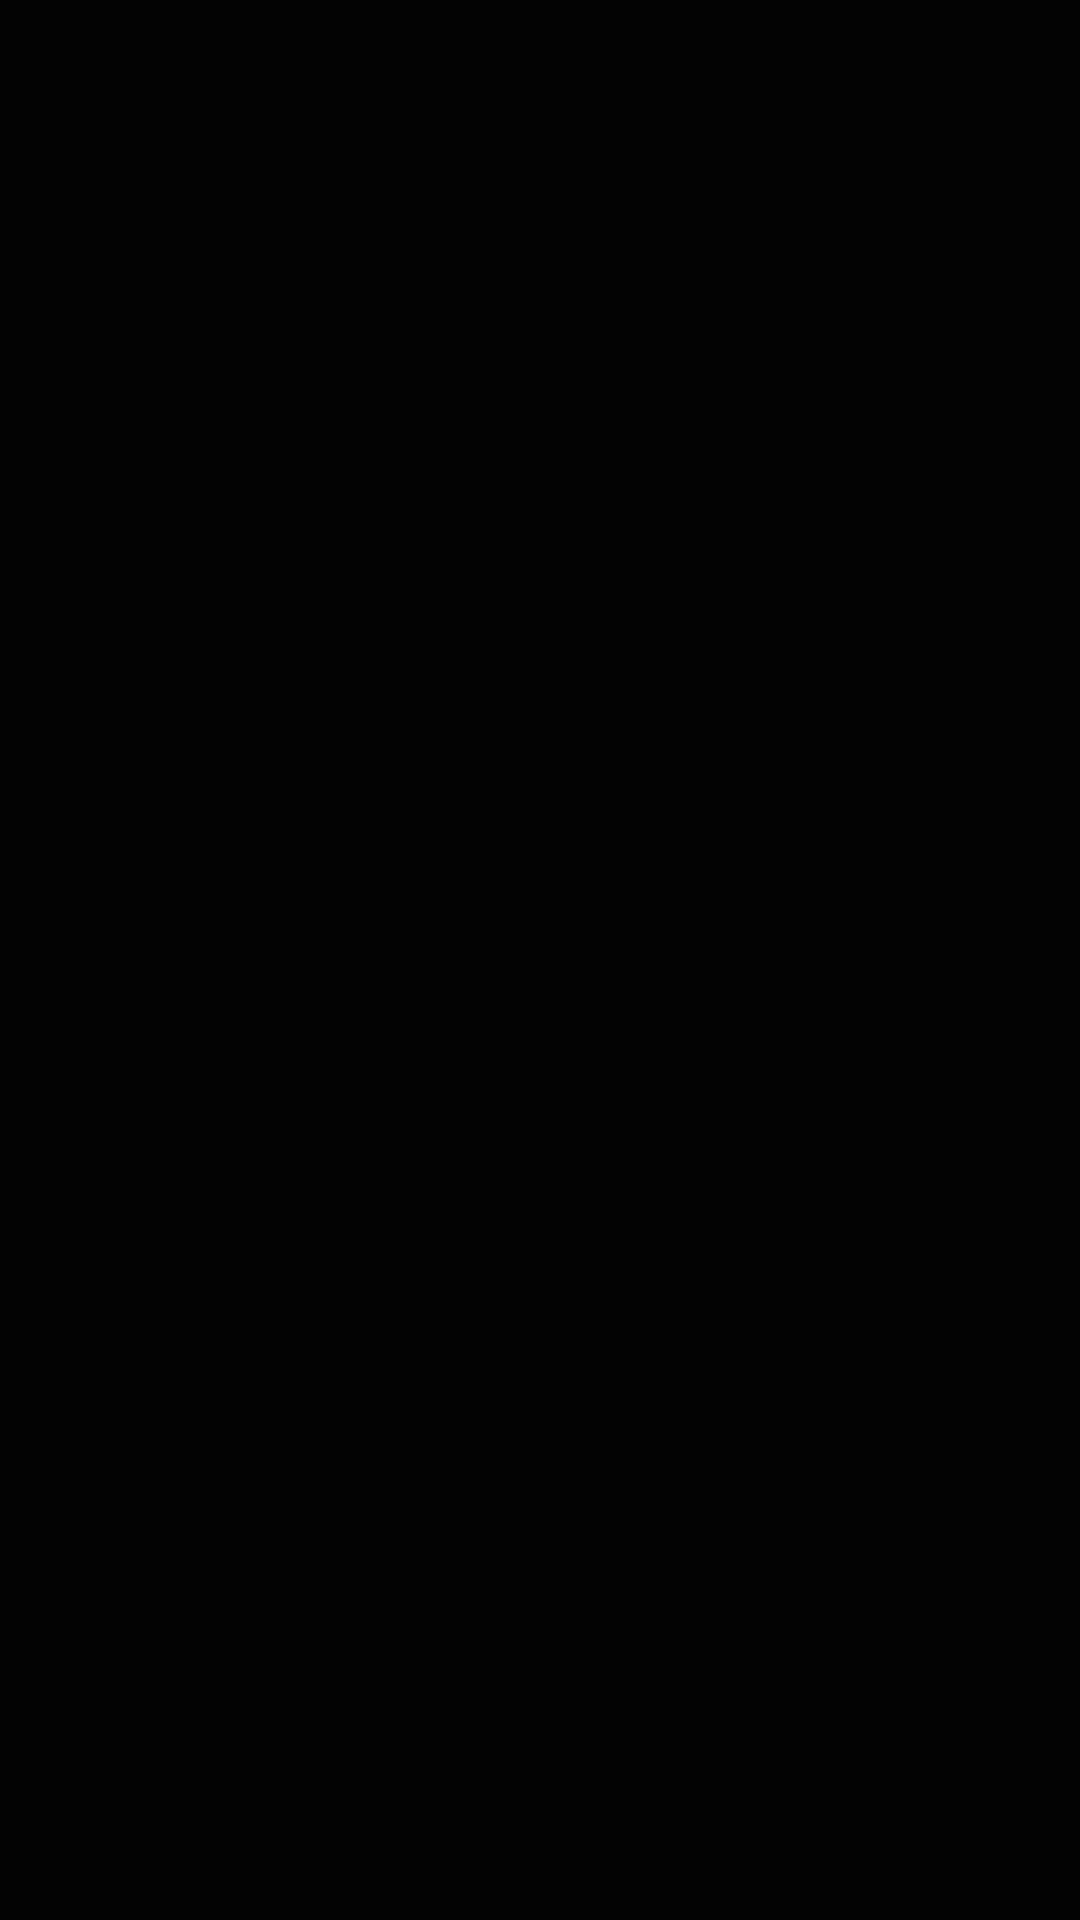 plain-pure-solid-black-wallpaper.jpg (1080×1920)